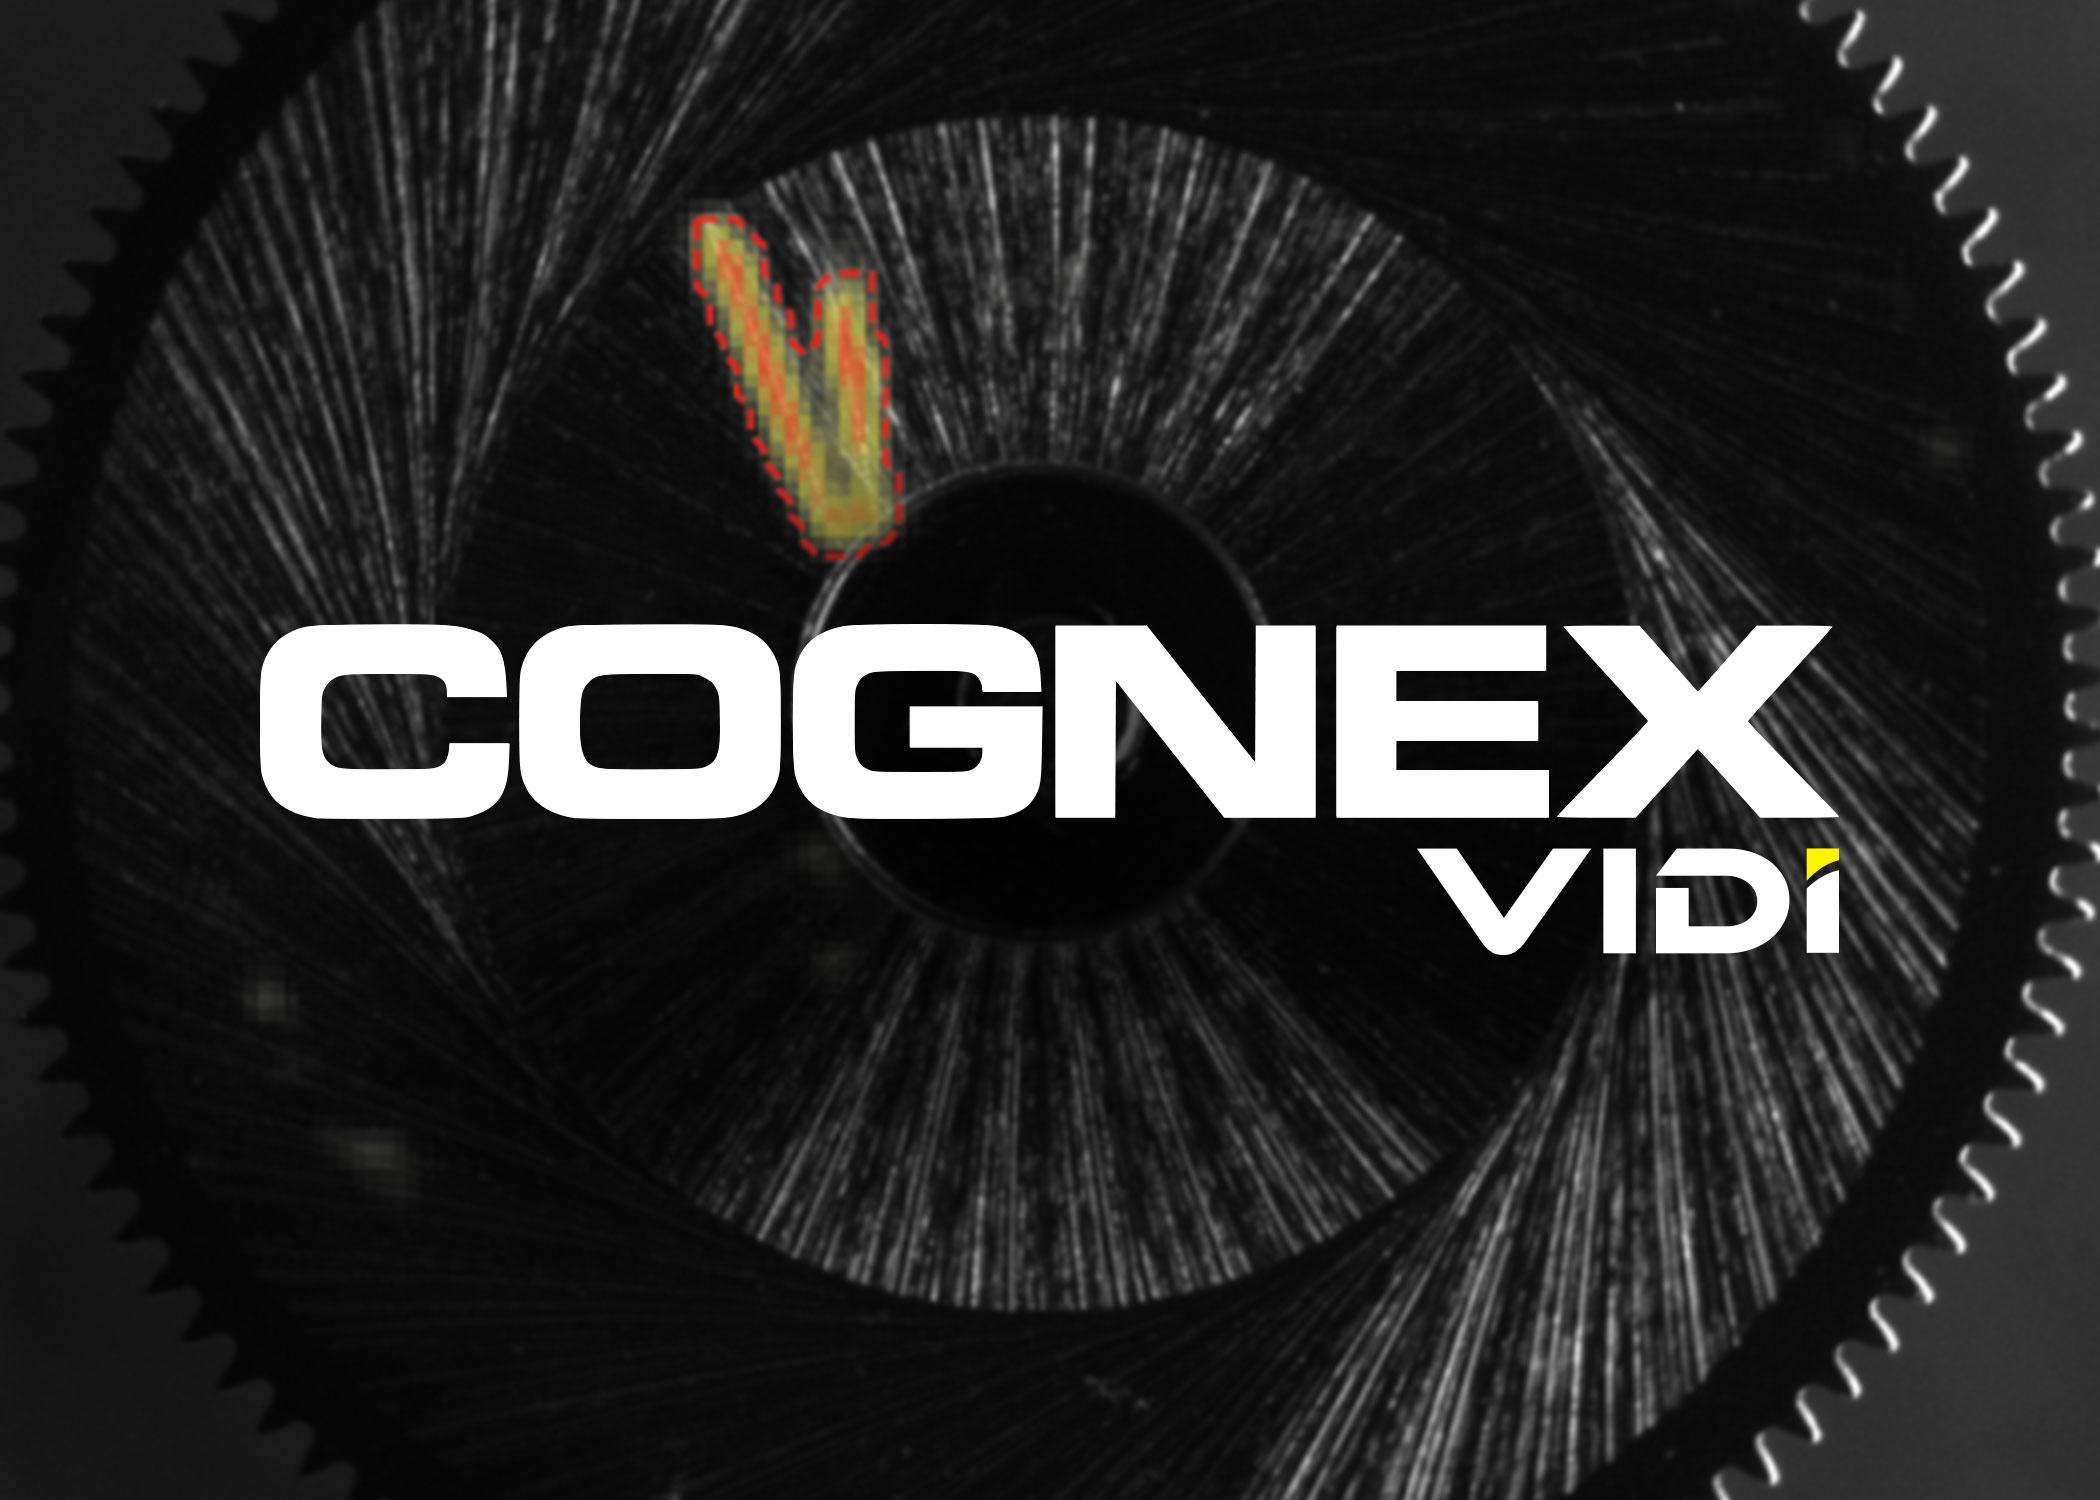 cognex vidi logo on black image with heat map identified defect